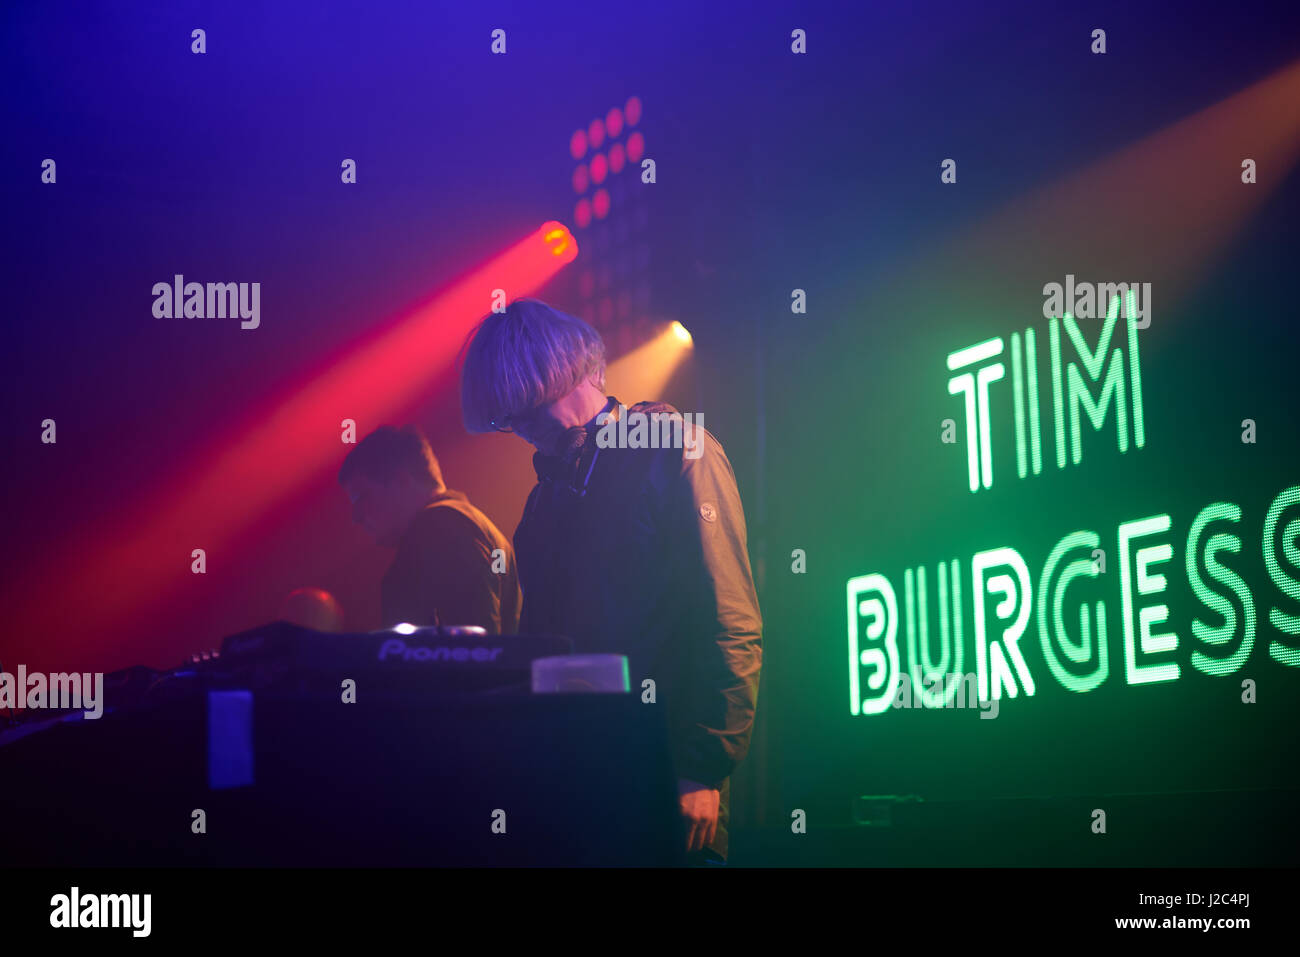 Tim Burgess DJing live at the BBC Radio 6 Music Festival, Salford Manchester. - Stock Image